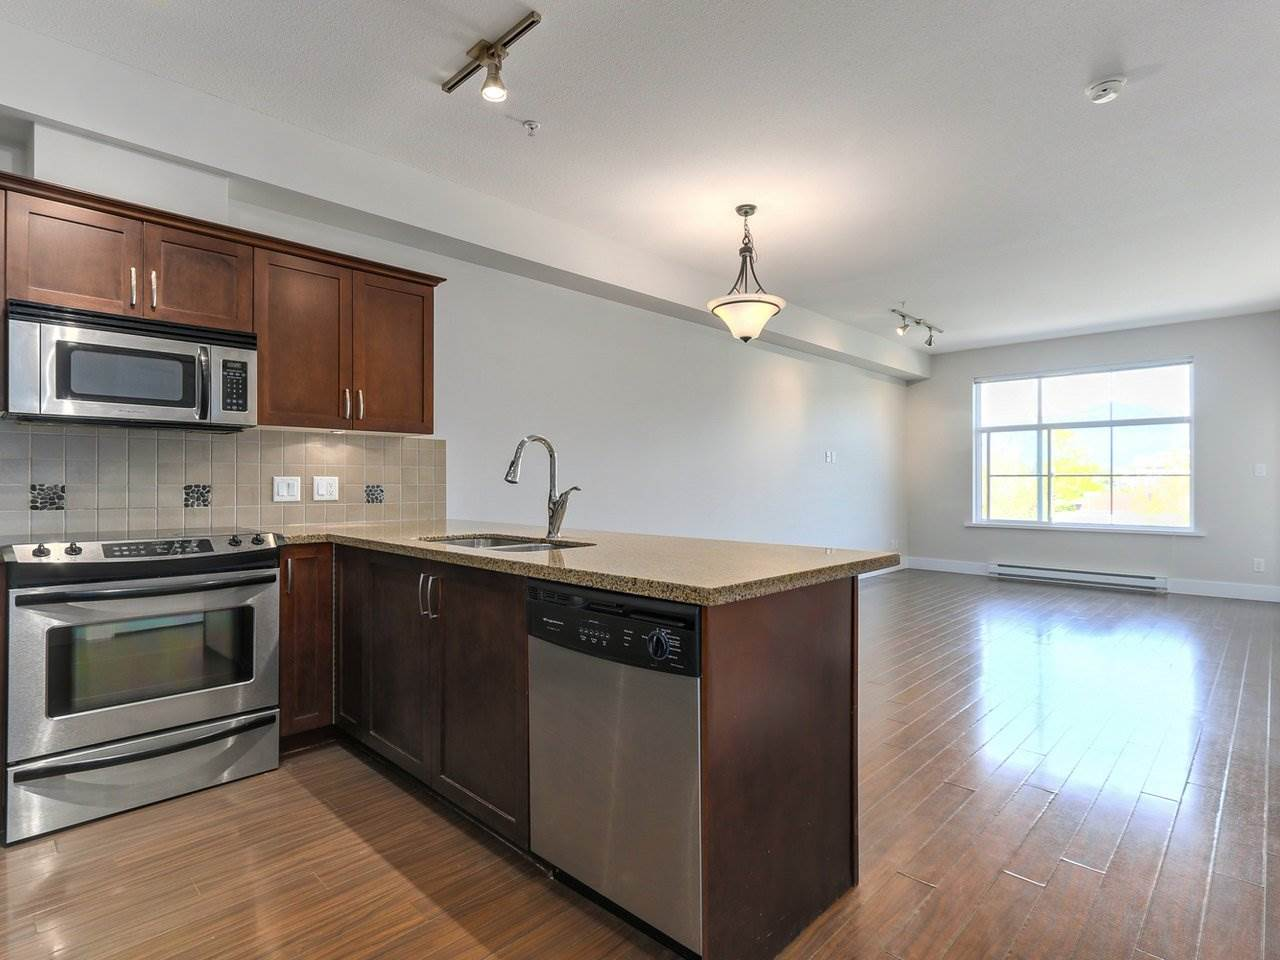 Sold: 321 - 1336 Main Street, Squamish, BC